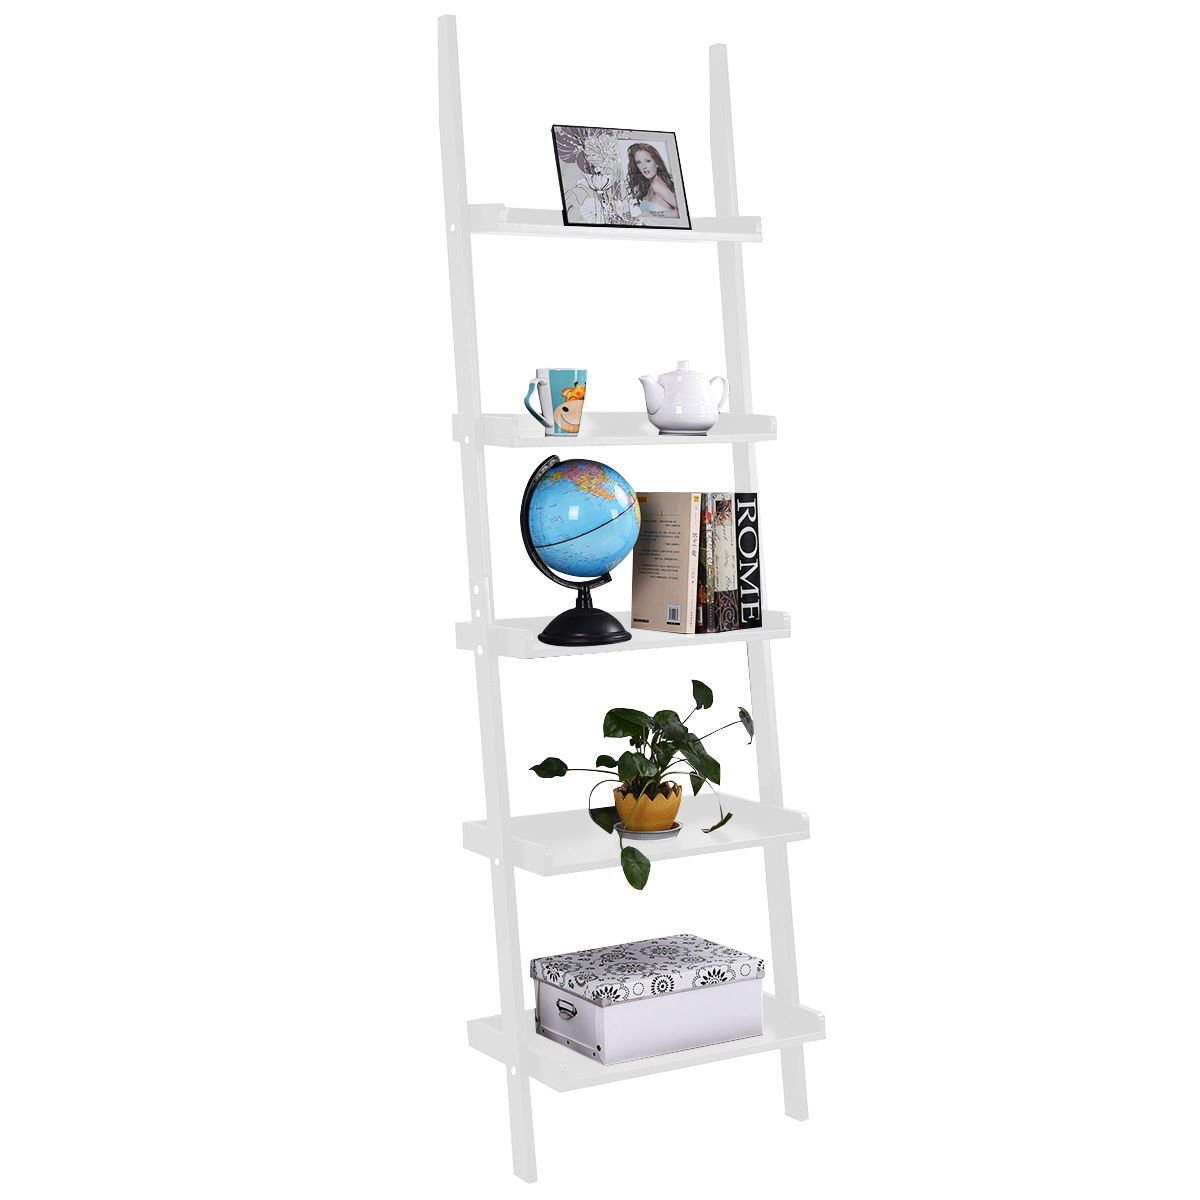 New White 5-Tier Bookcase Bookshelf Leaning Wall Shelf Ladder Storage Display Furniture